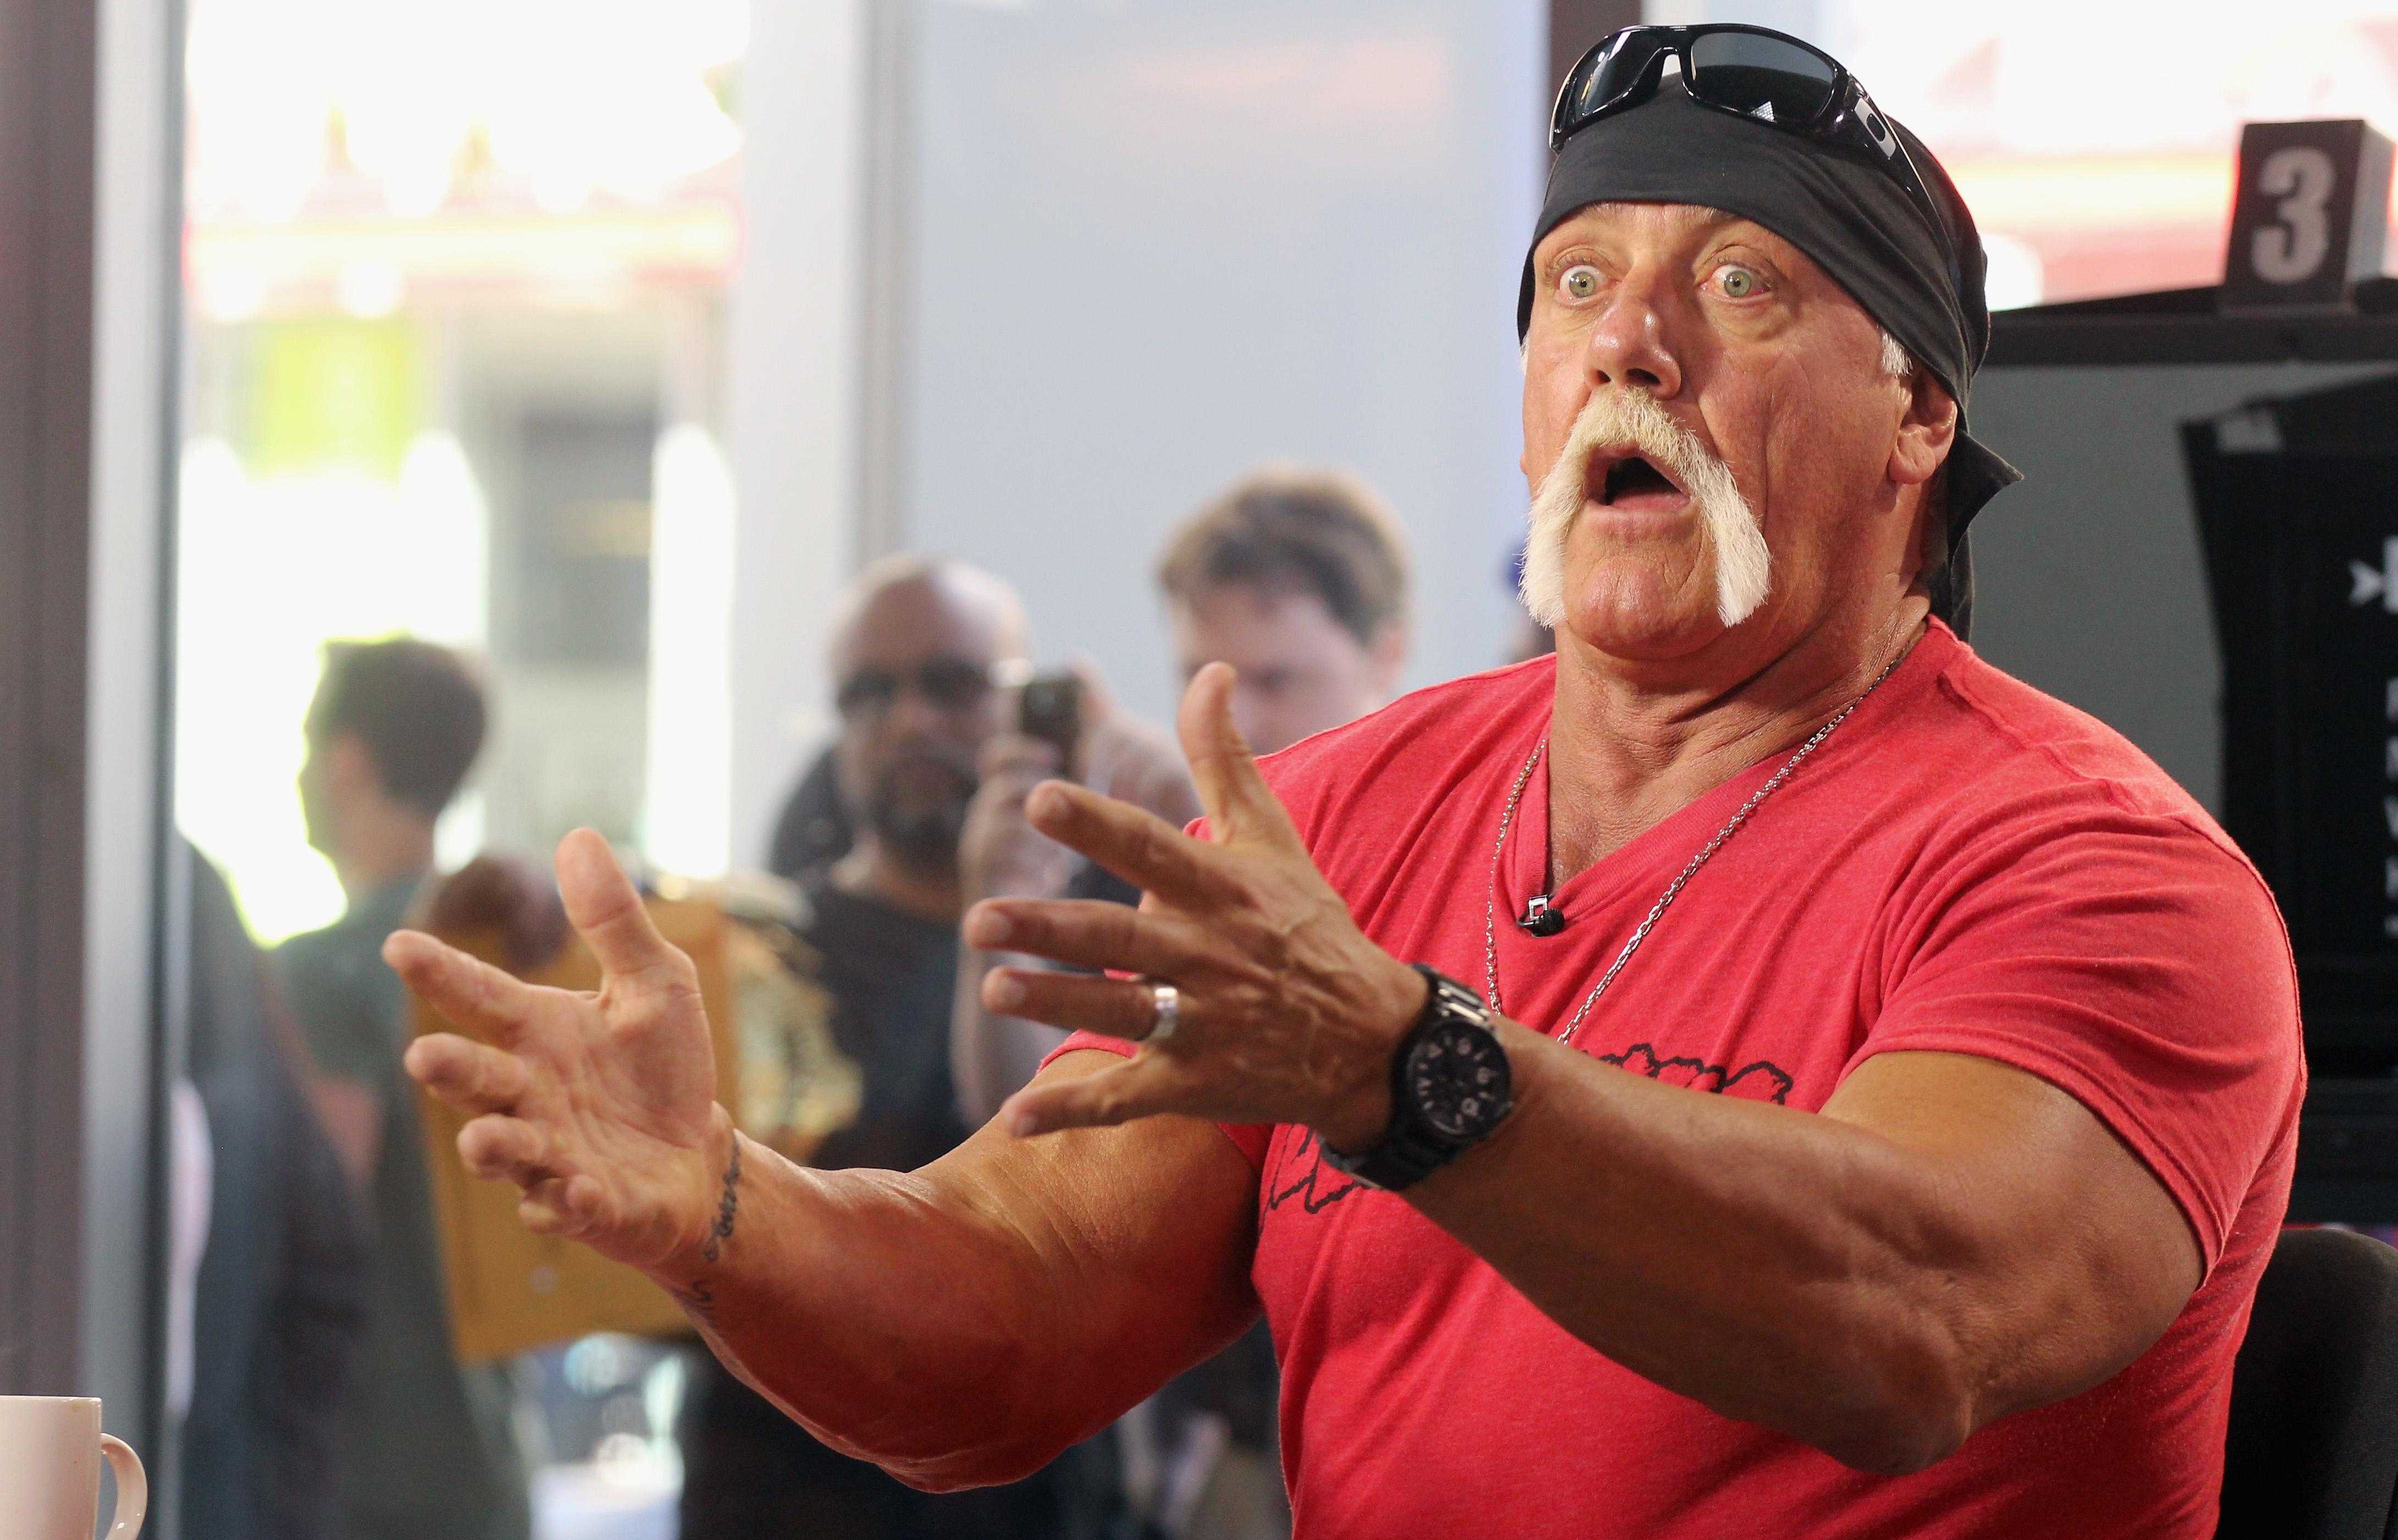 Hulk Hogan duped into tweeting about 'sick sister' Cheryl Fernandez-Versini